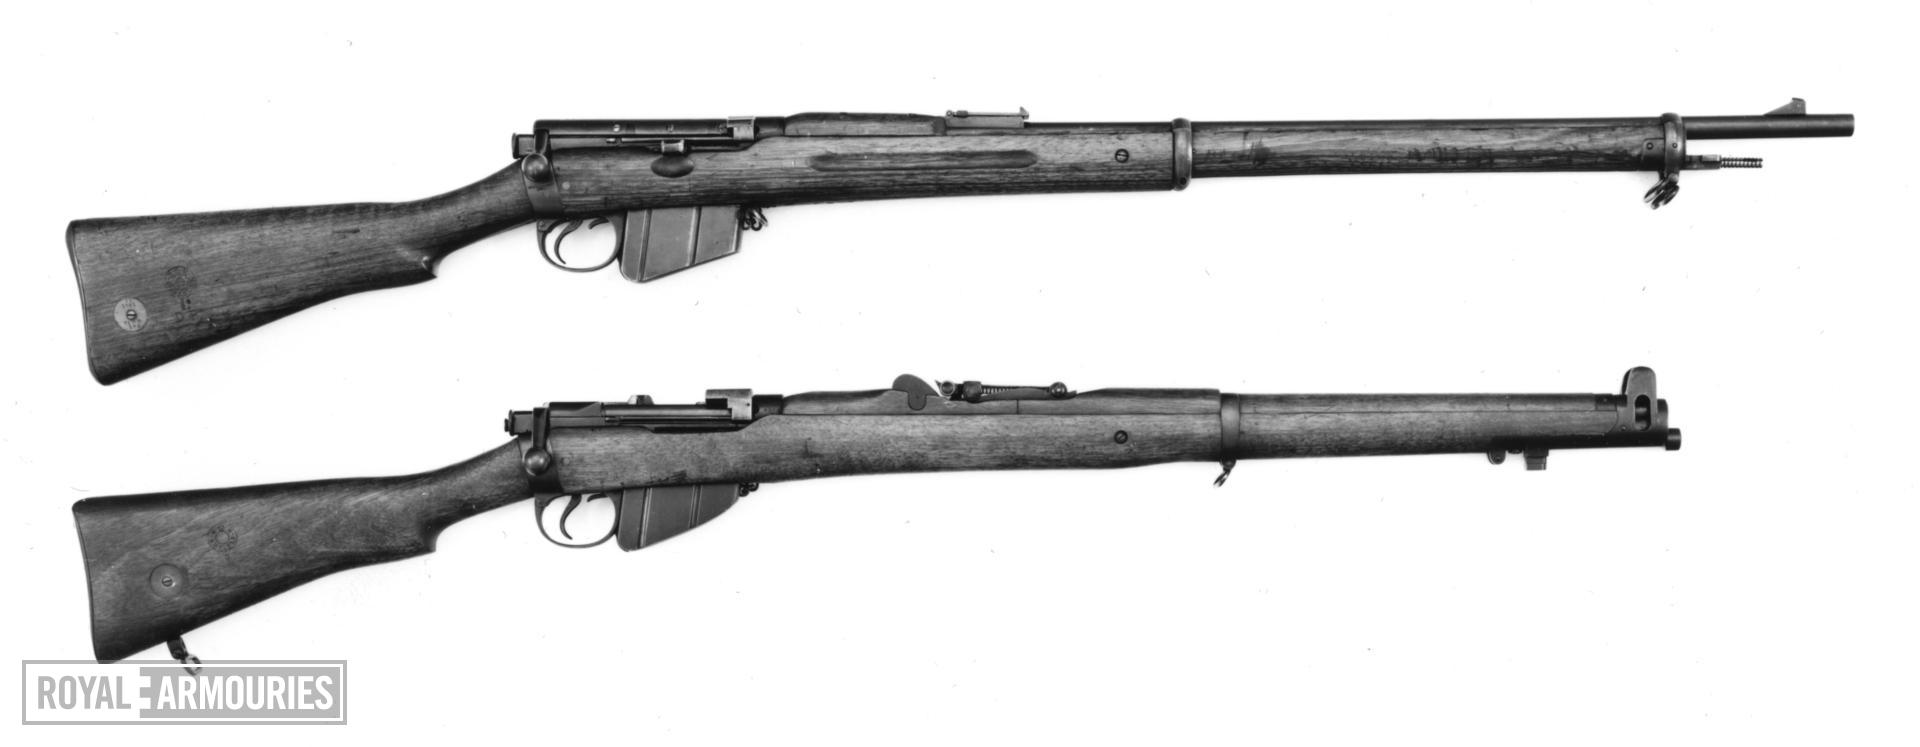 Centrefire bolt-action magazine rifle - Lee-Metford Mk. I